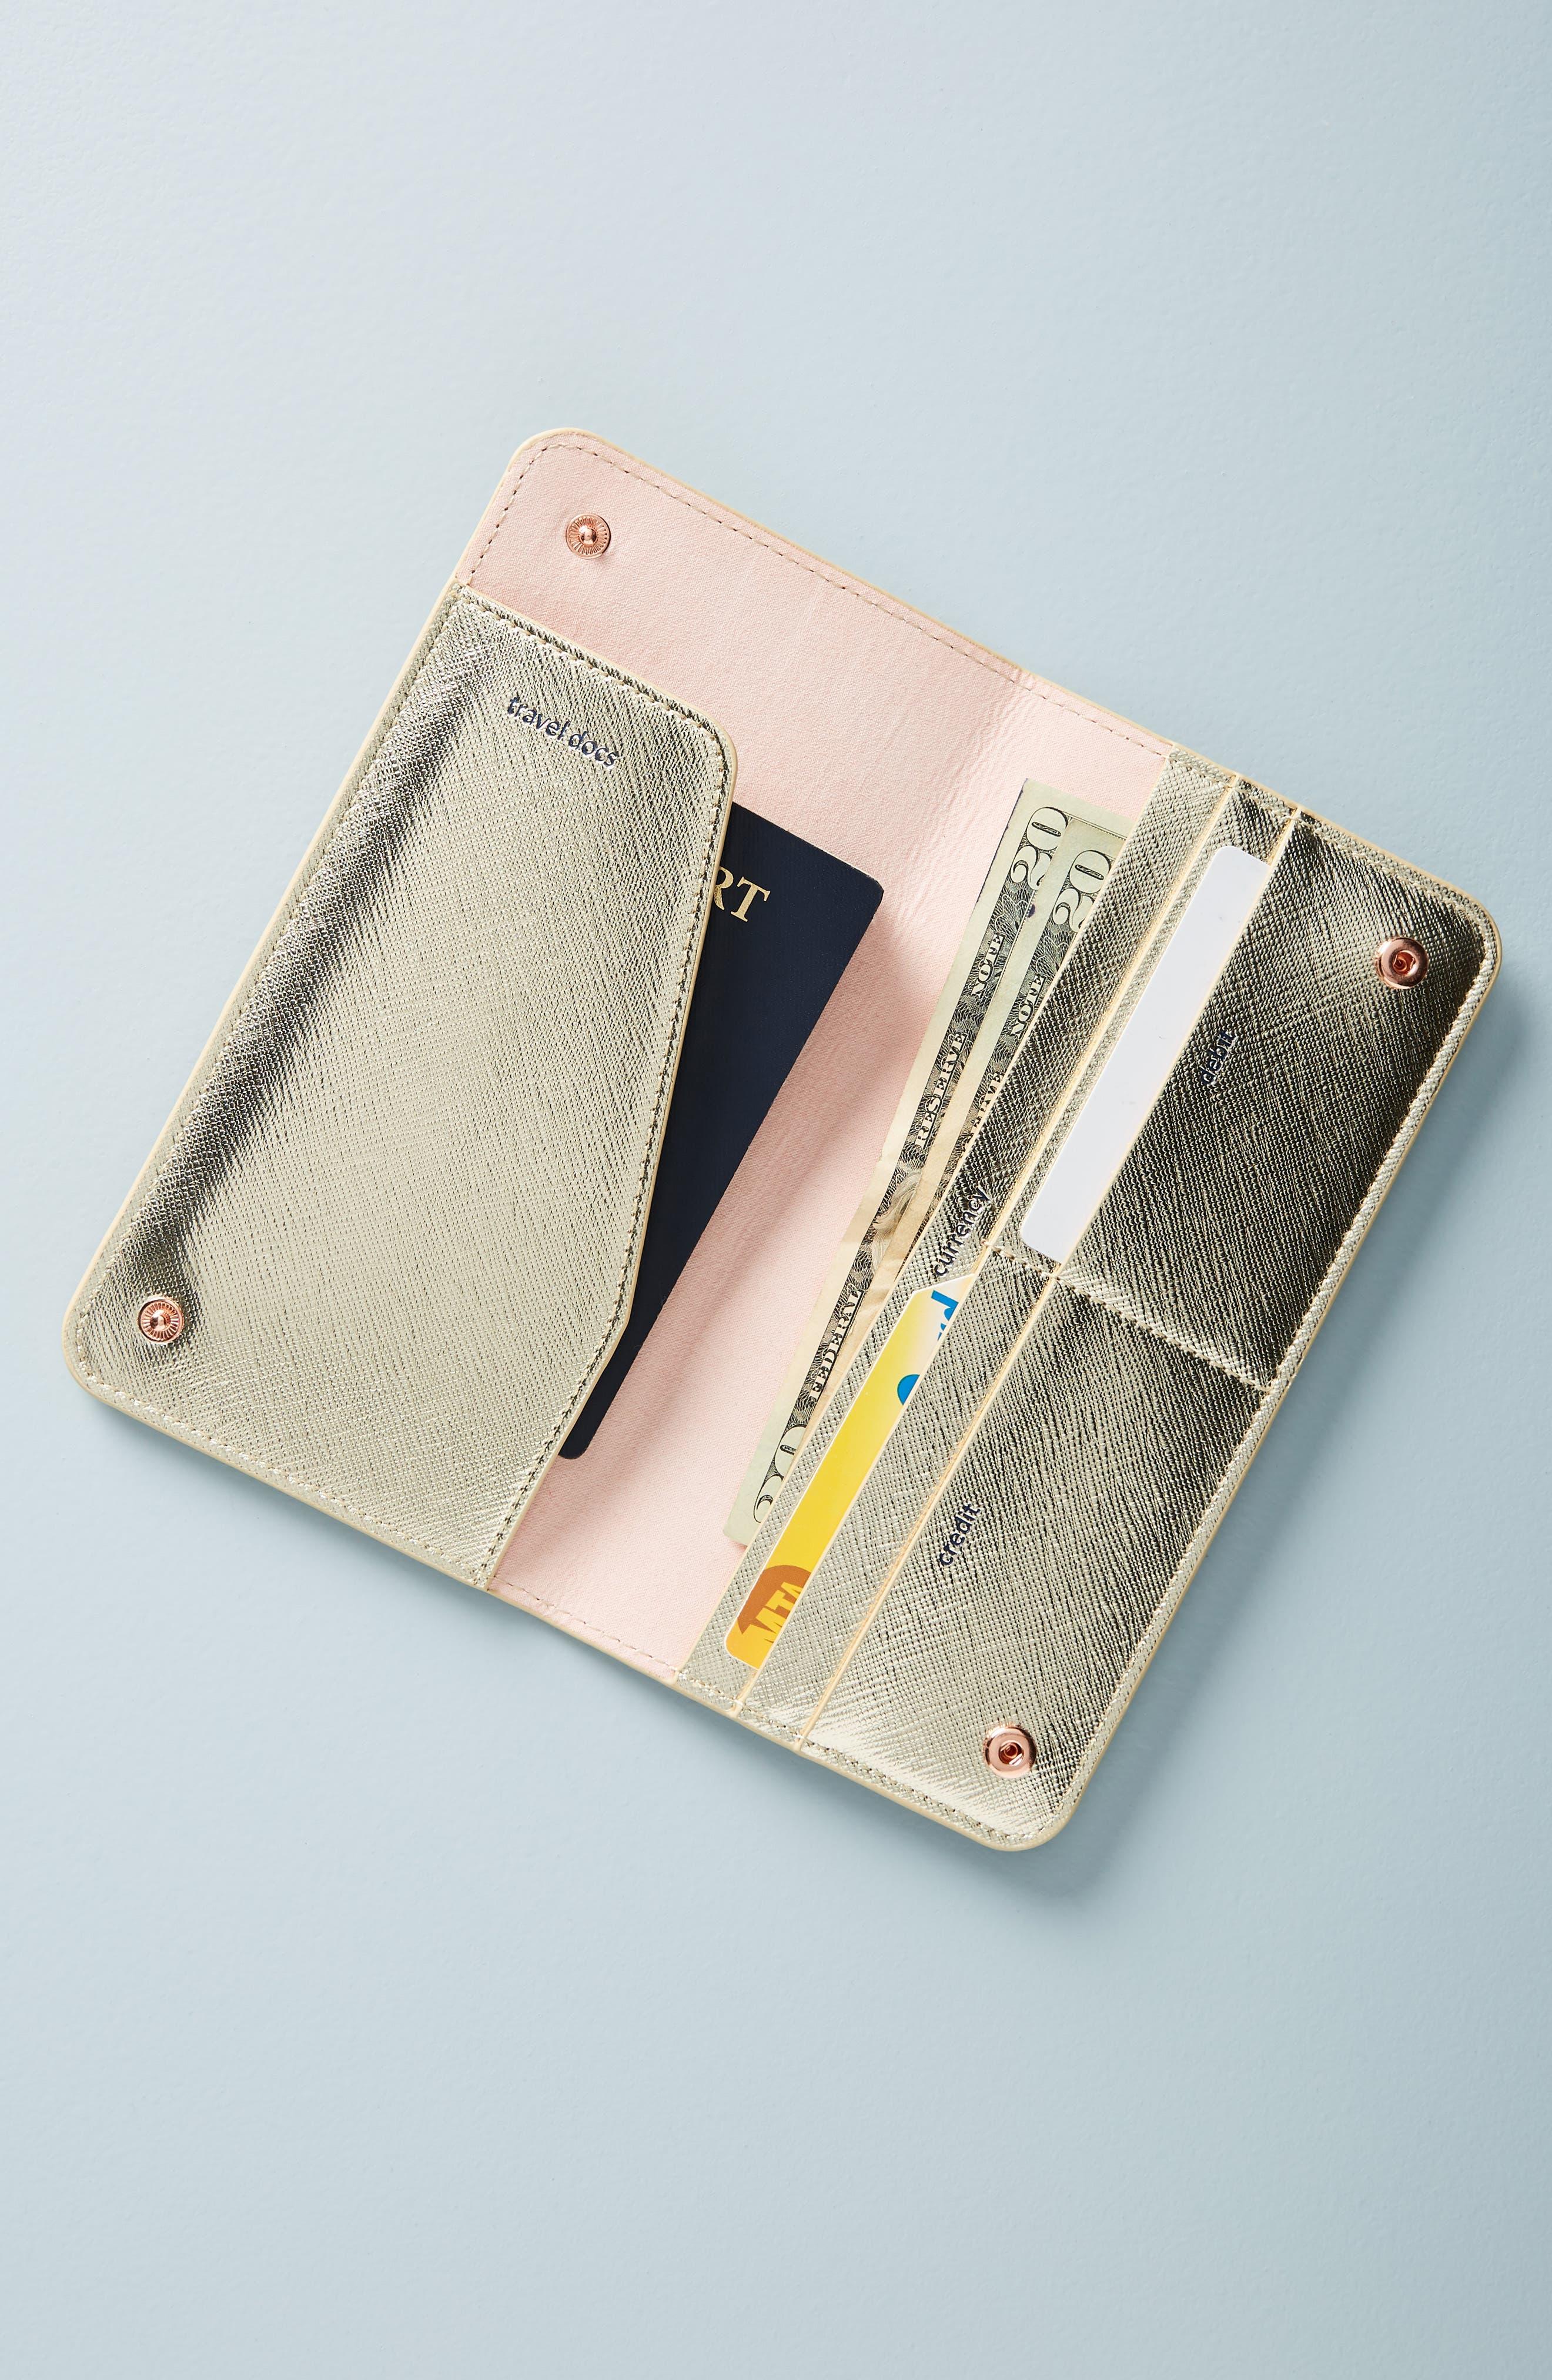 Celeste Travel Wallet,                             Alternate thumbnail 2, color,                             GOLD